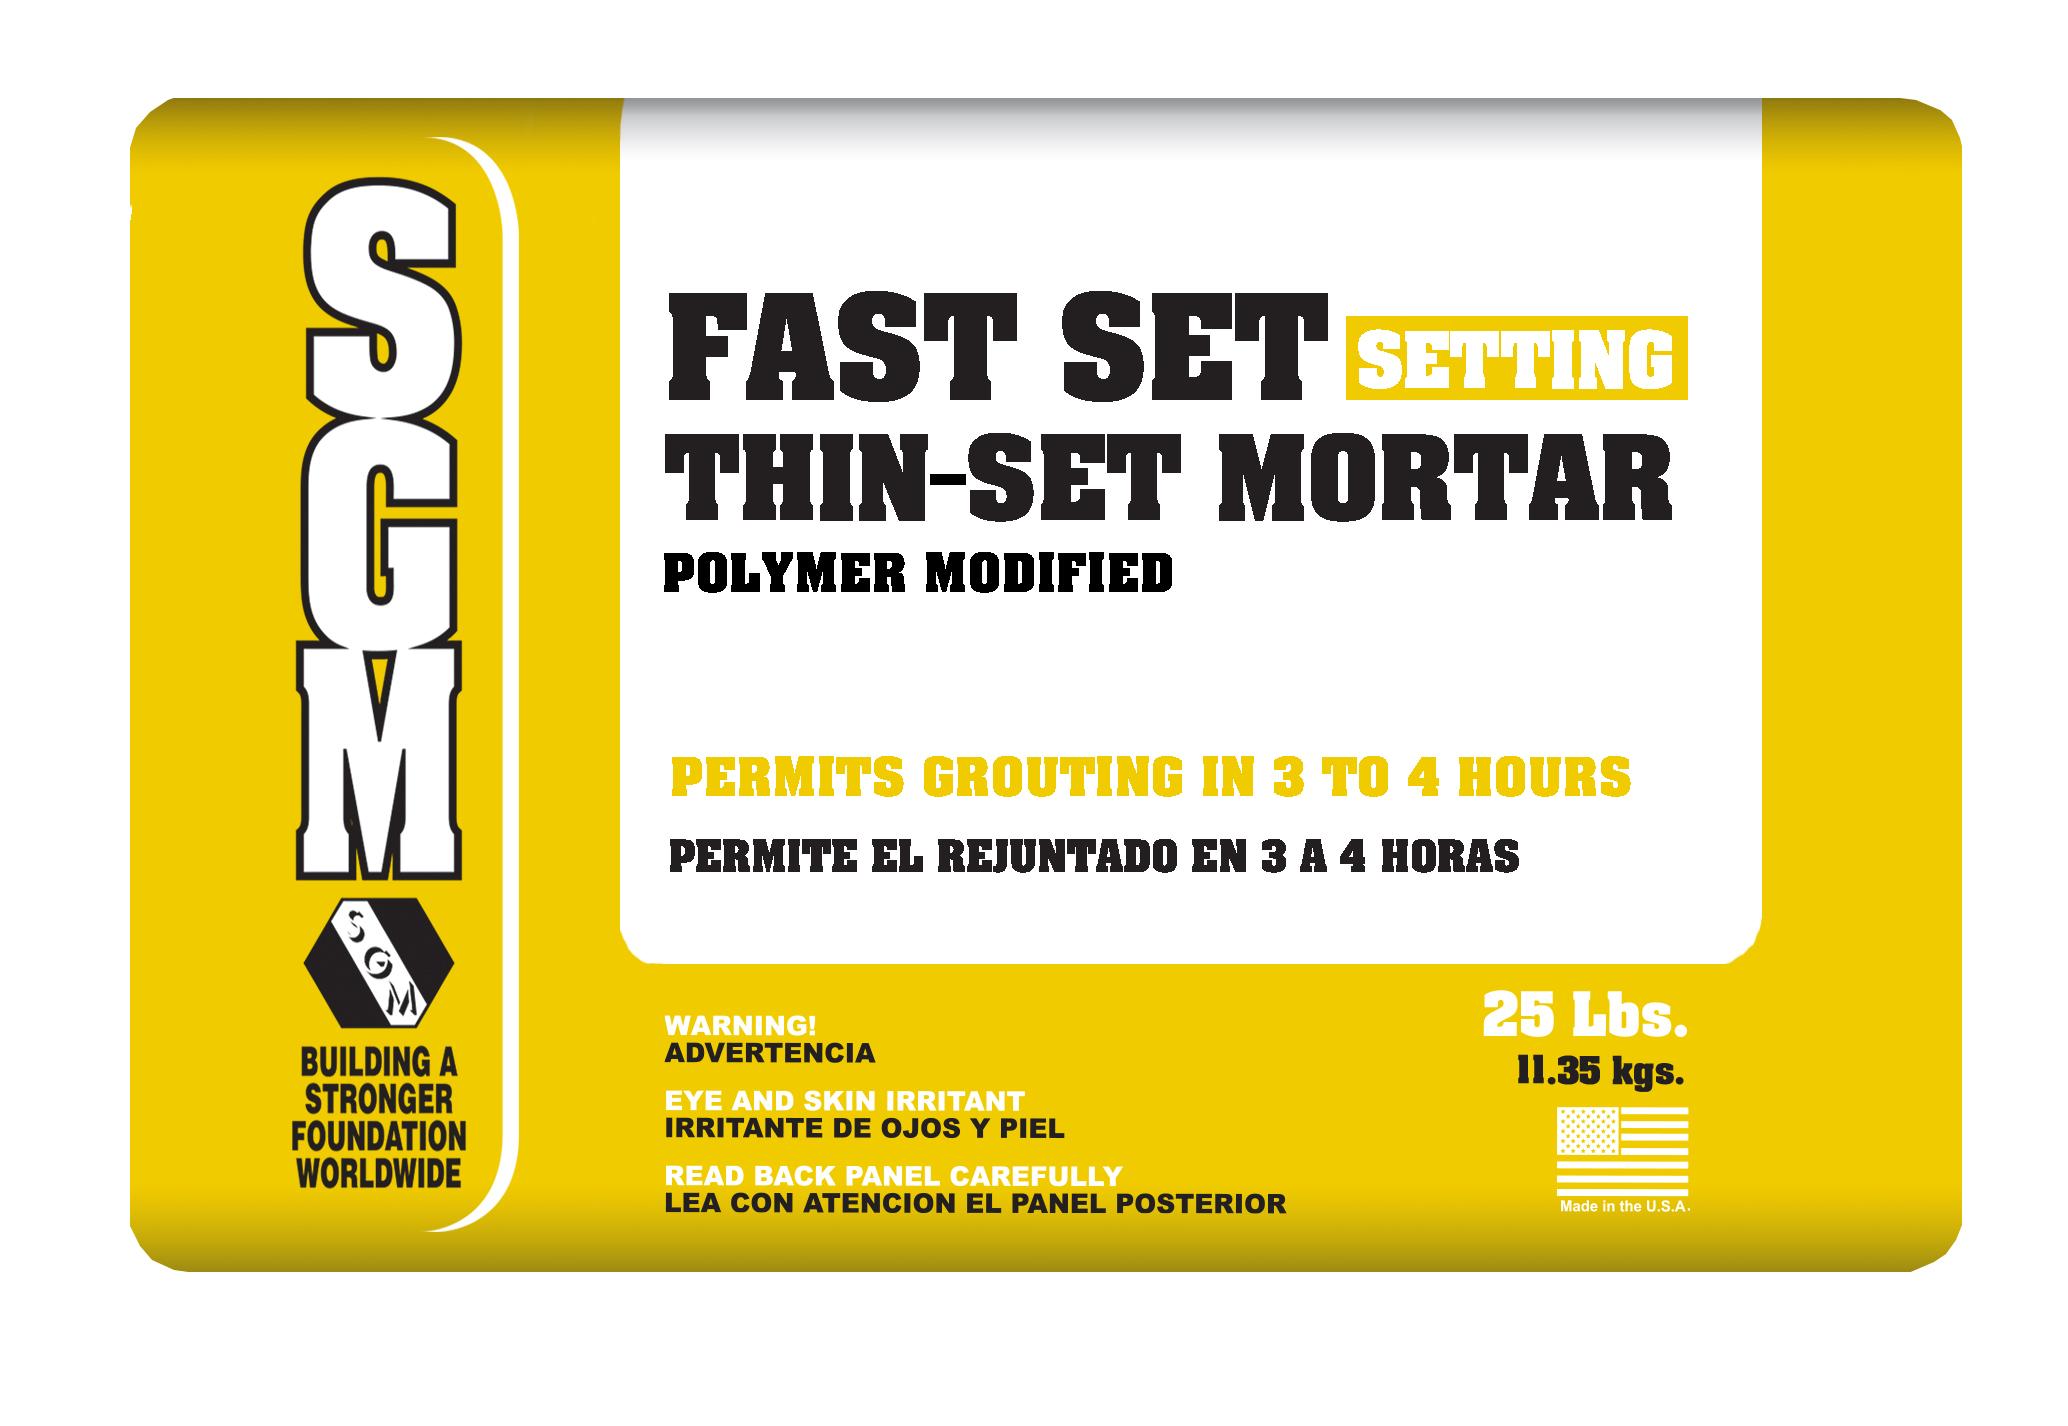 fast set thin set mortar polymer